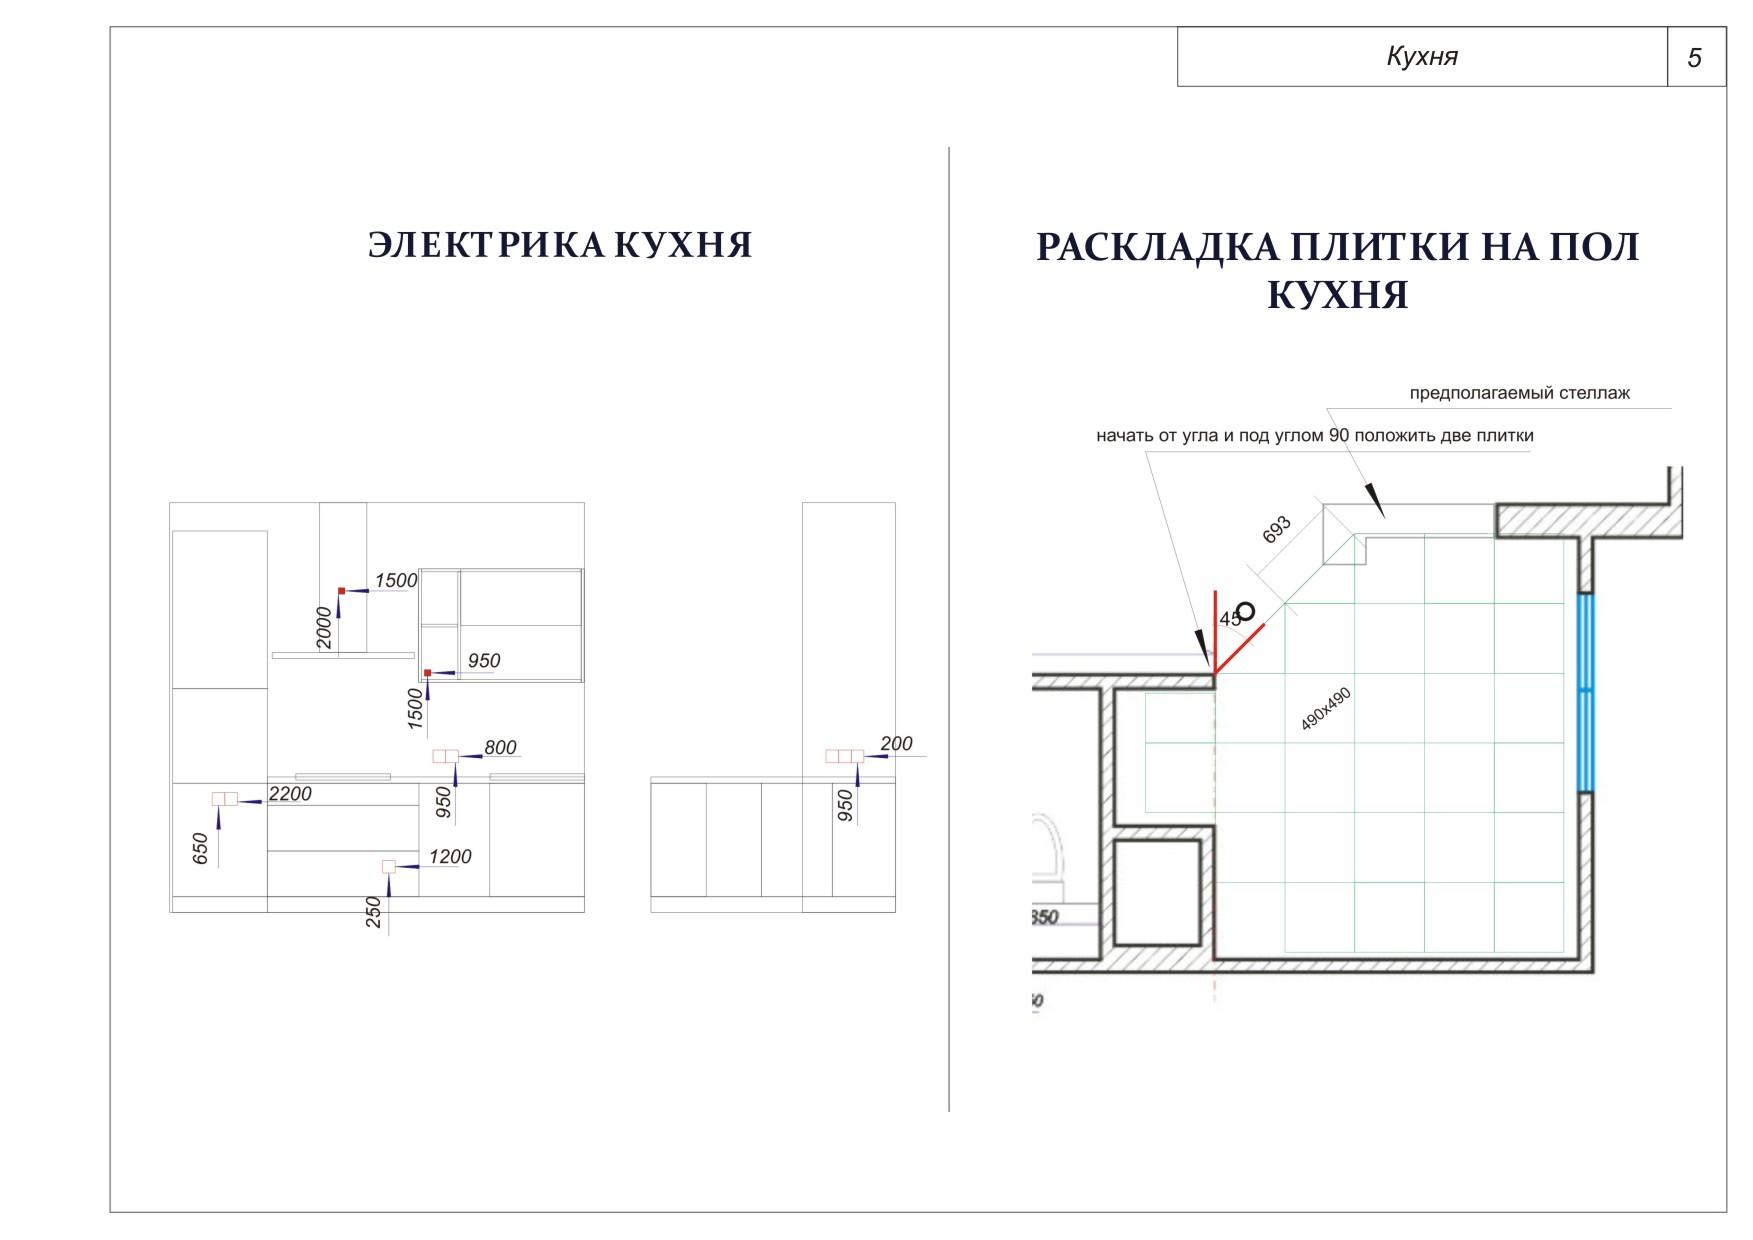 objedinenie_dvuh_kvartir_5_raskladka-plitki_elektrika